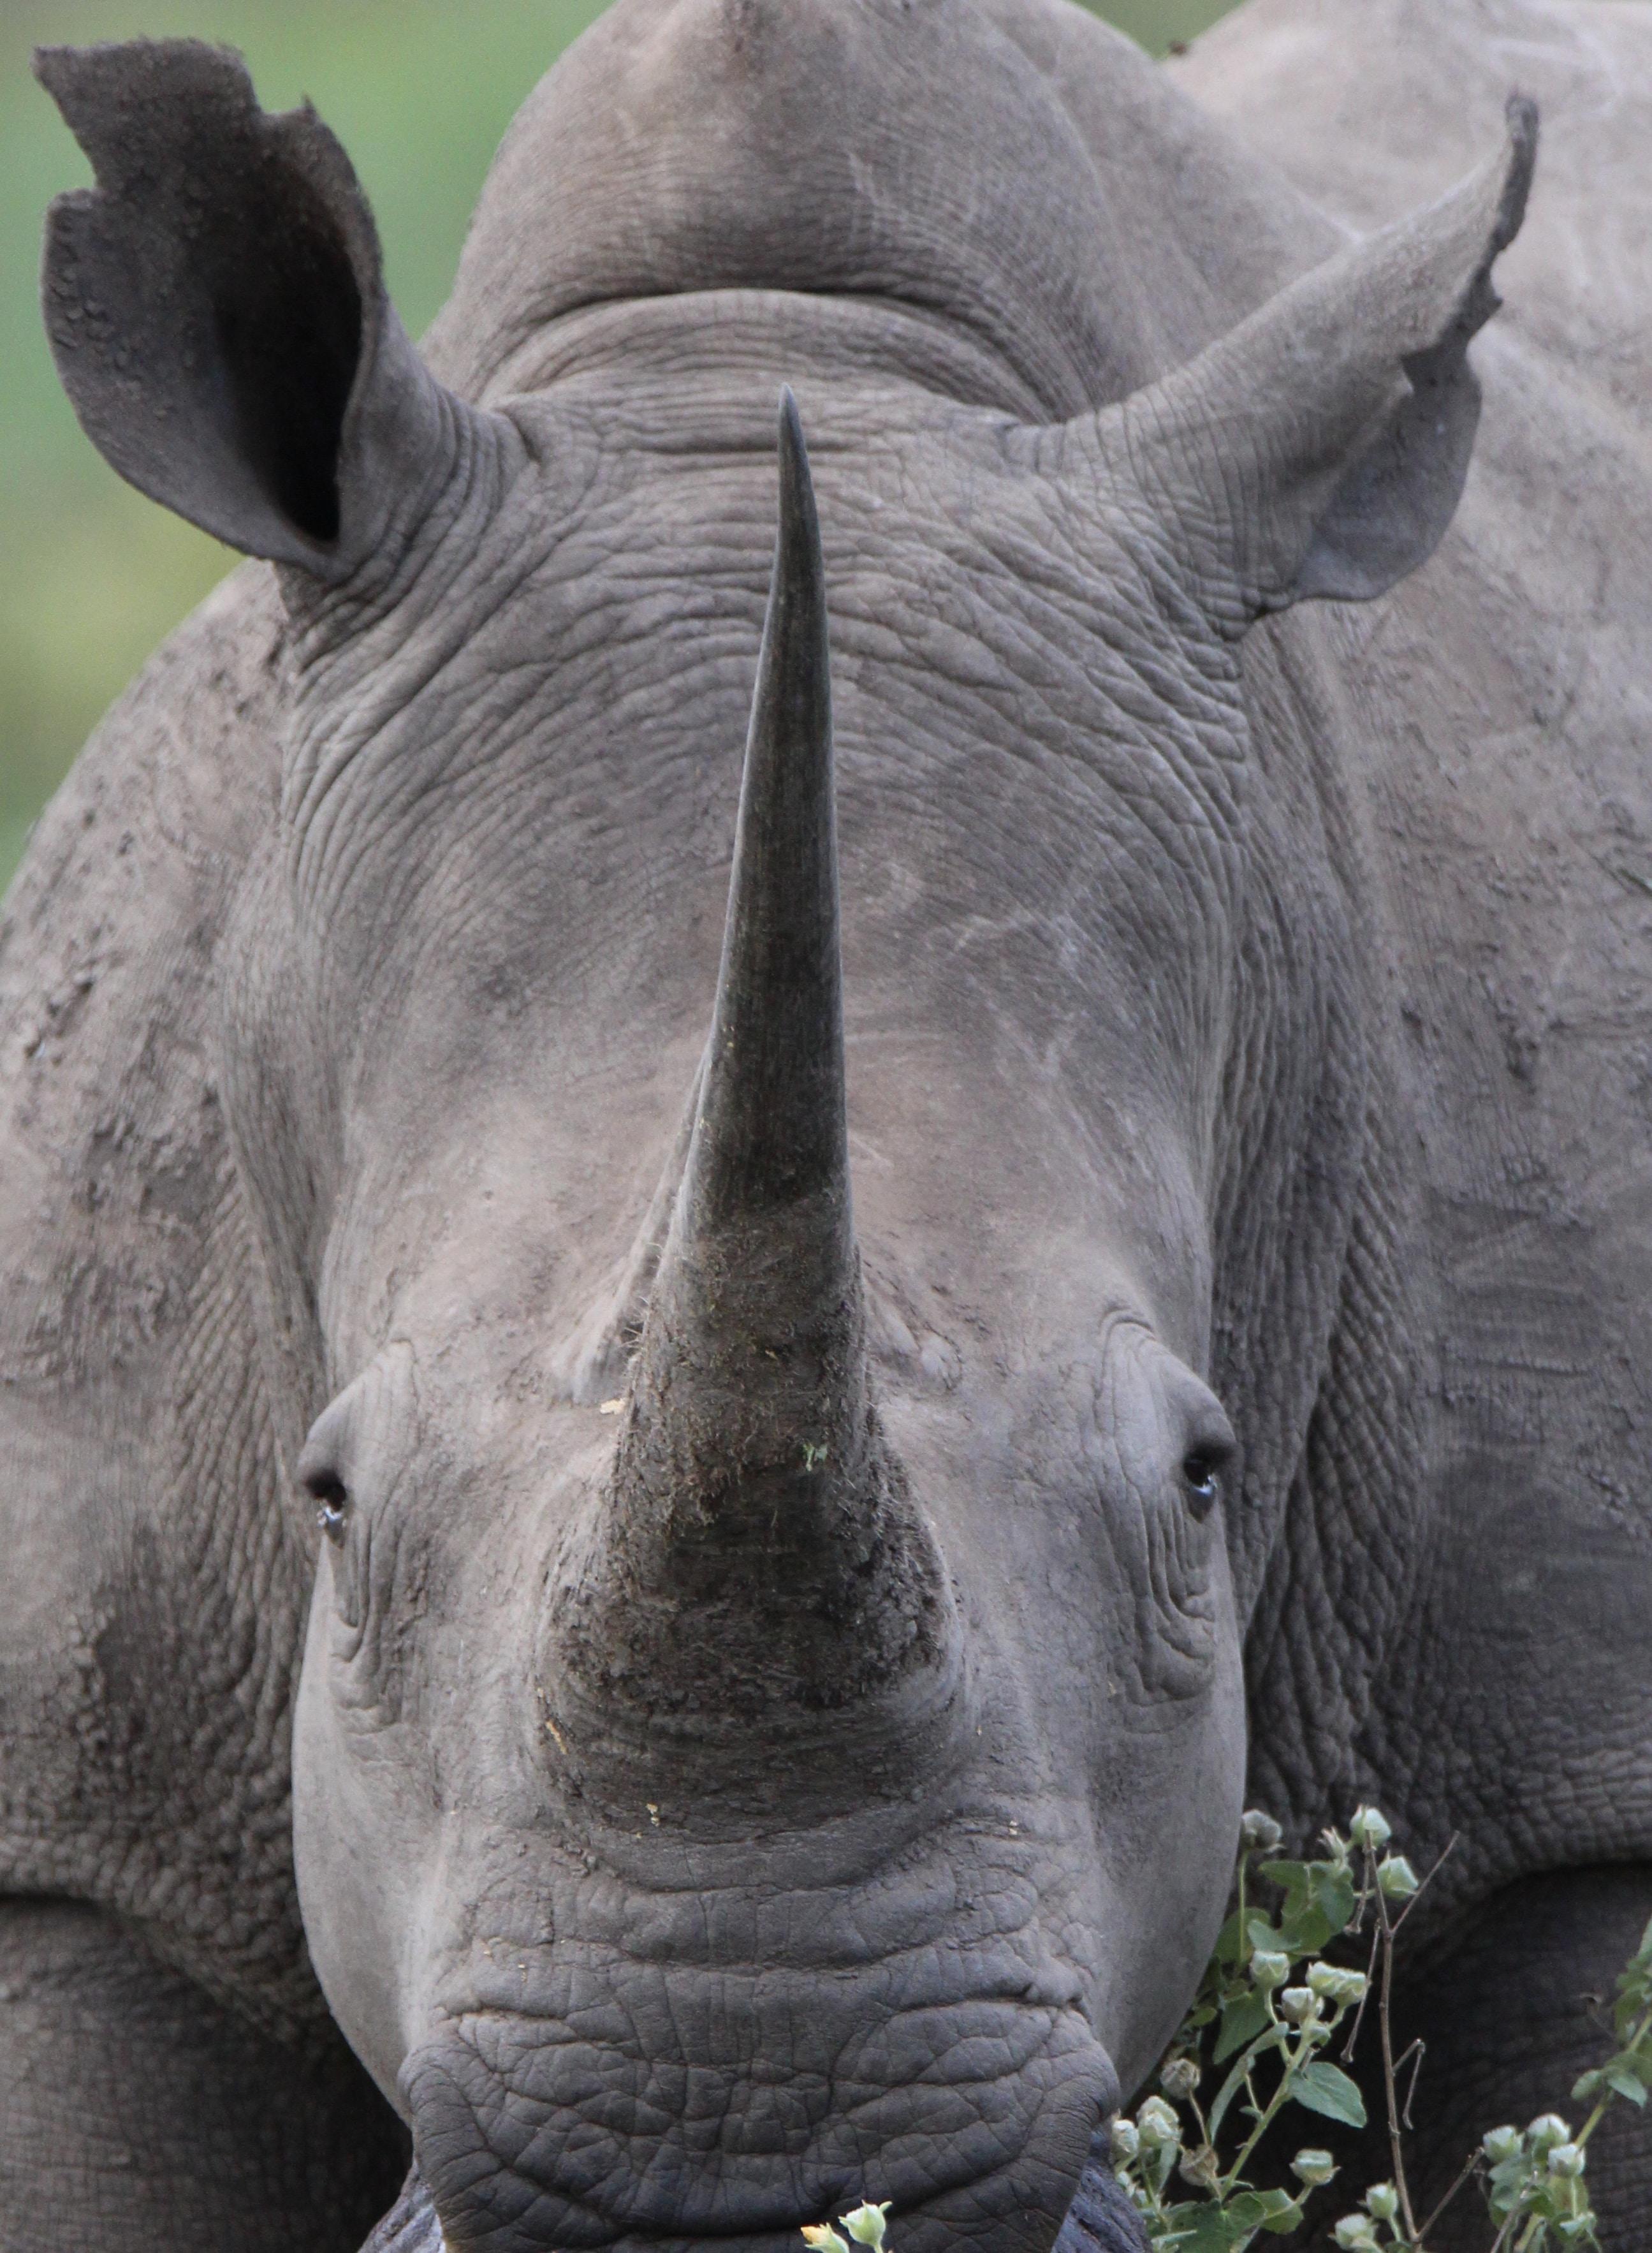 close up photography of gray rhino at daytime